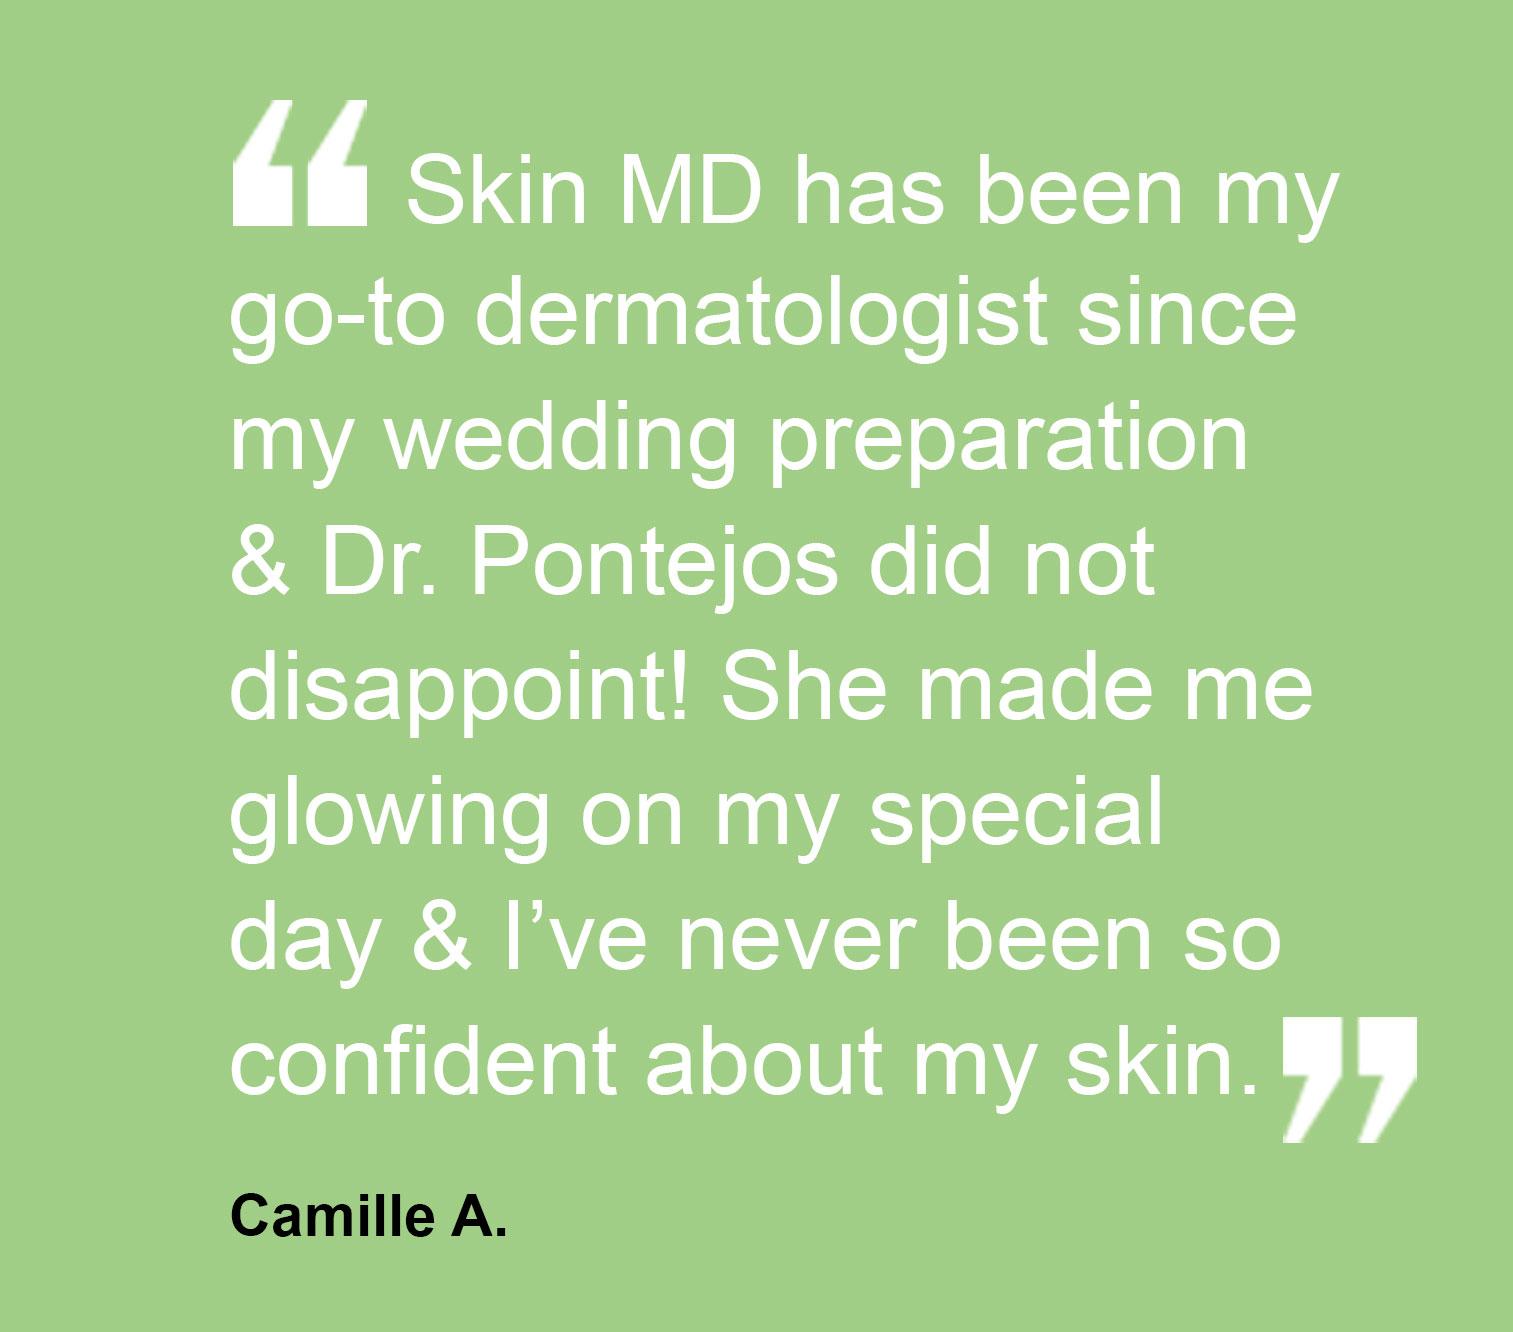 Testimonial - Camille A.